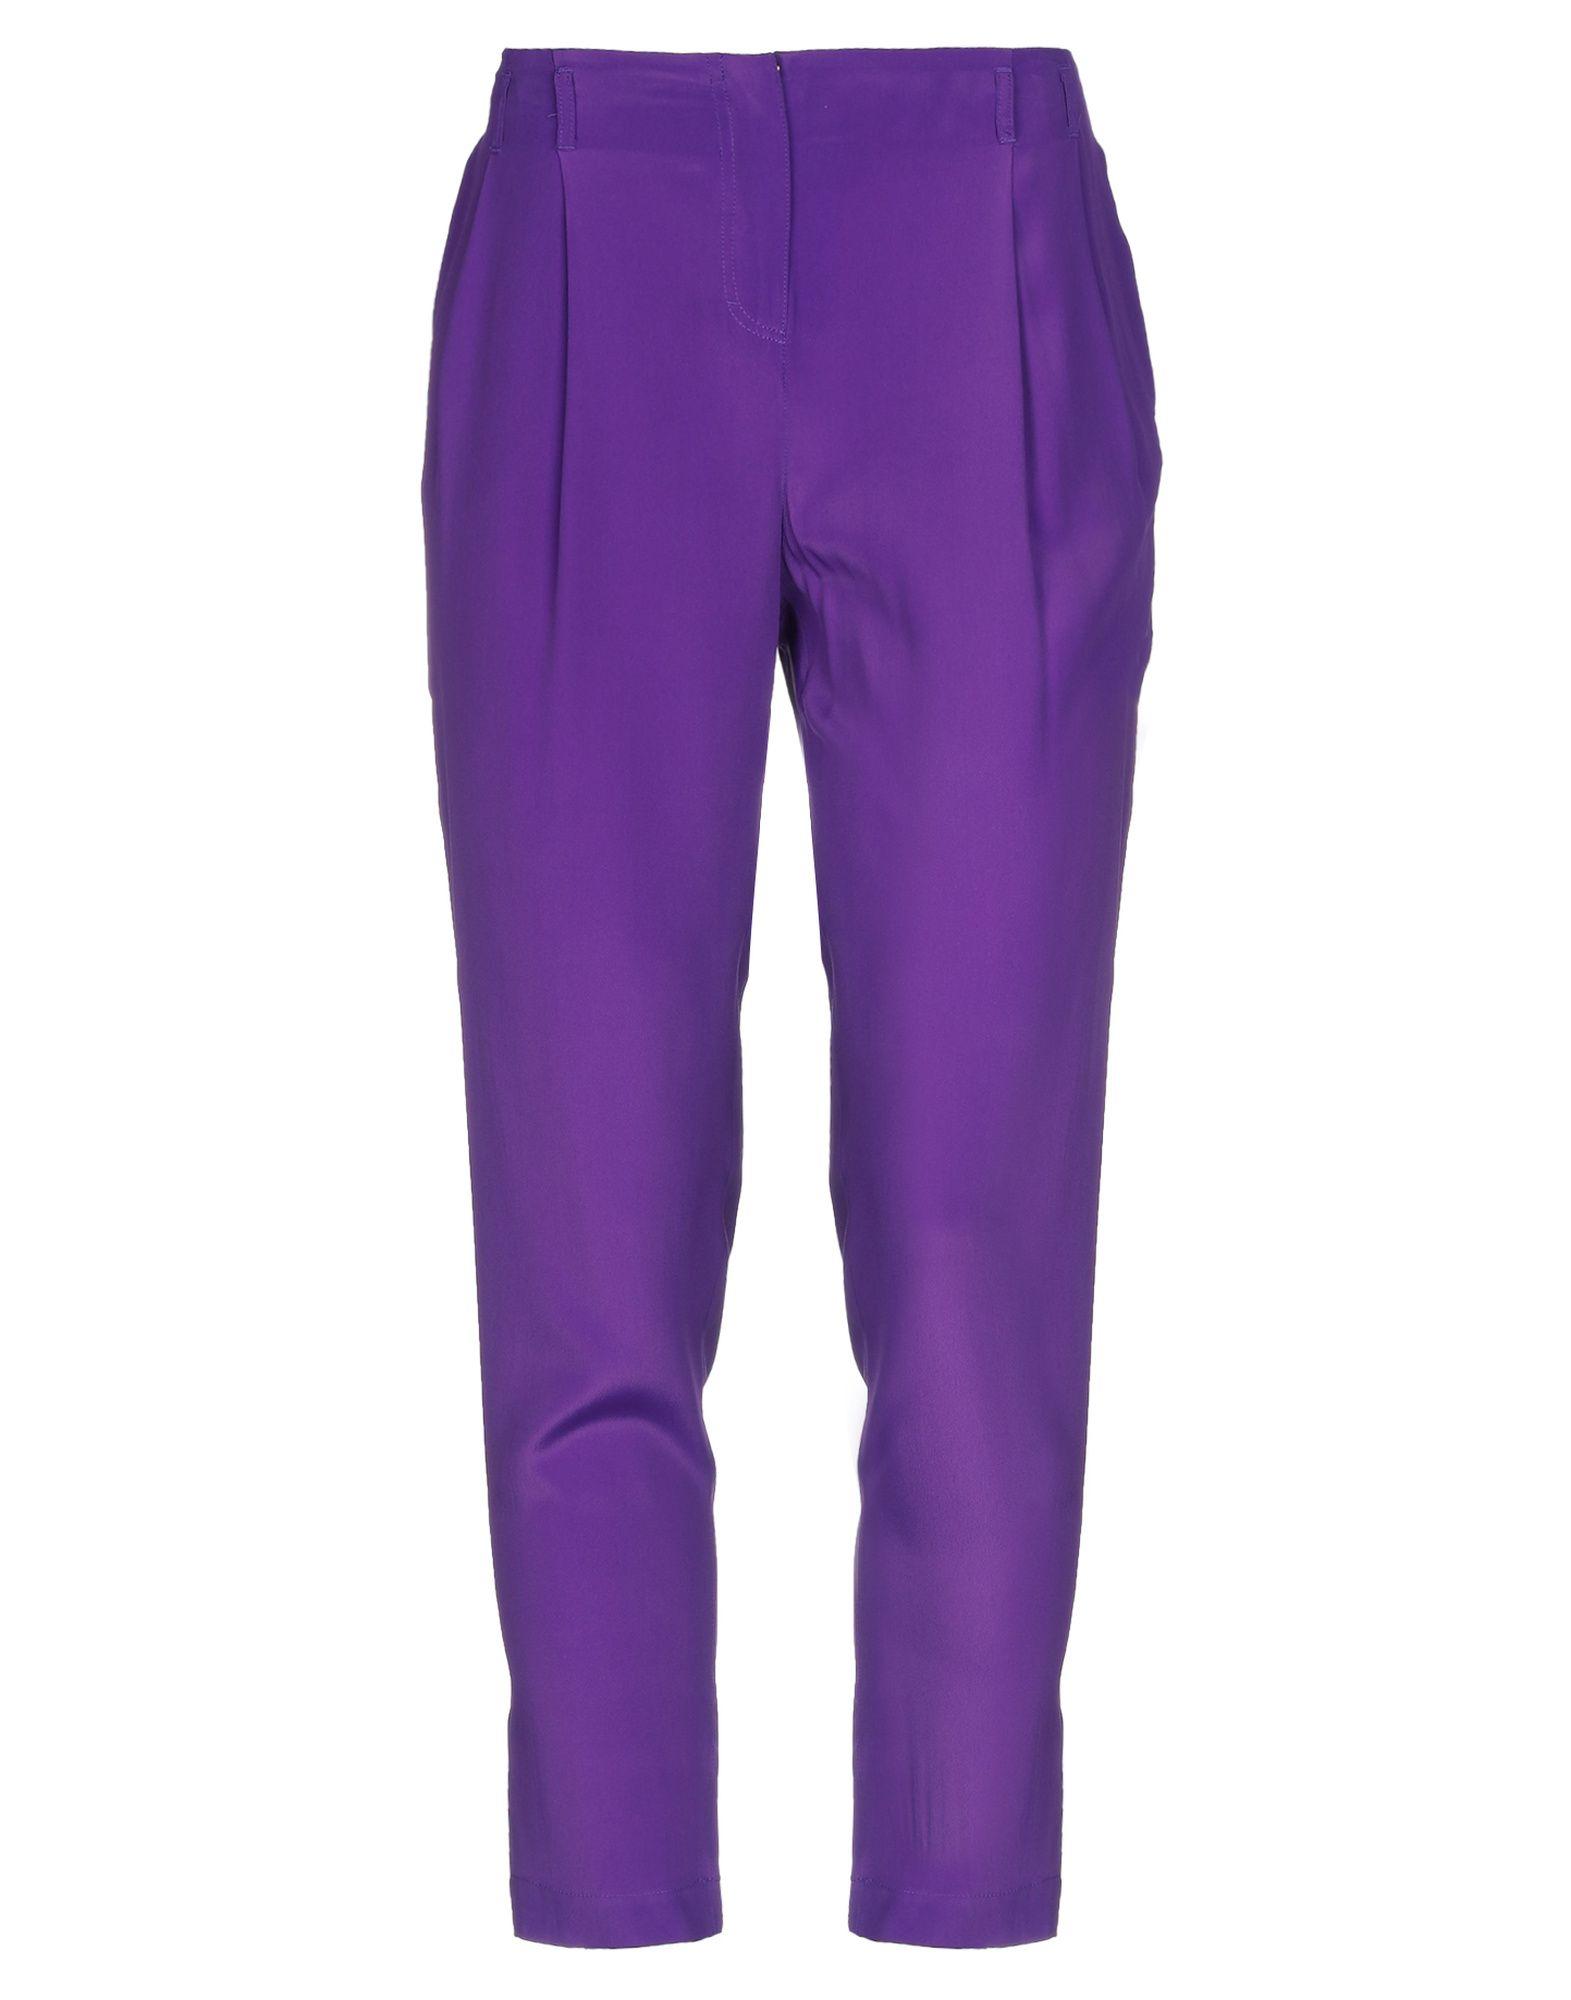 VIOLET ATOS LOMBARDINI Повседневные брюки violet atos lombardini легинсы page 6